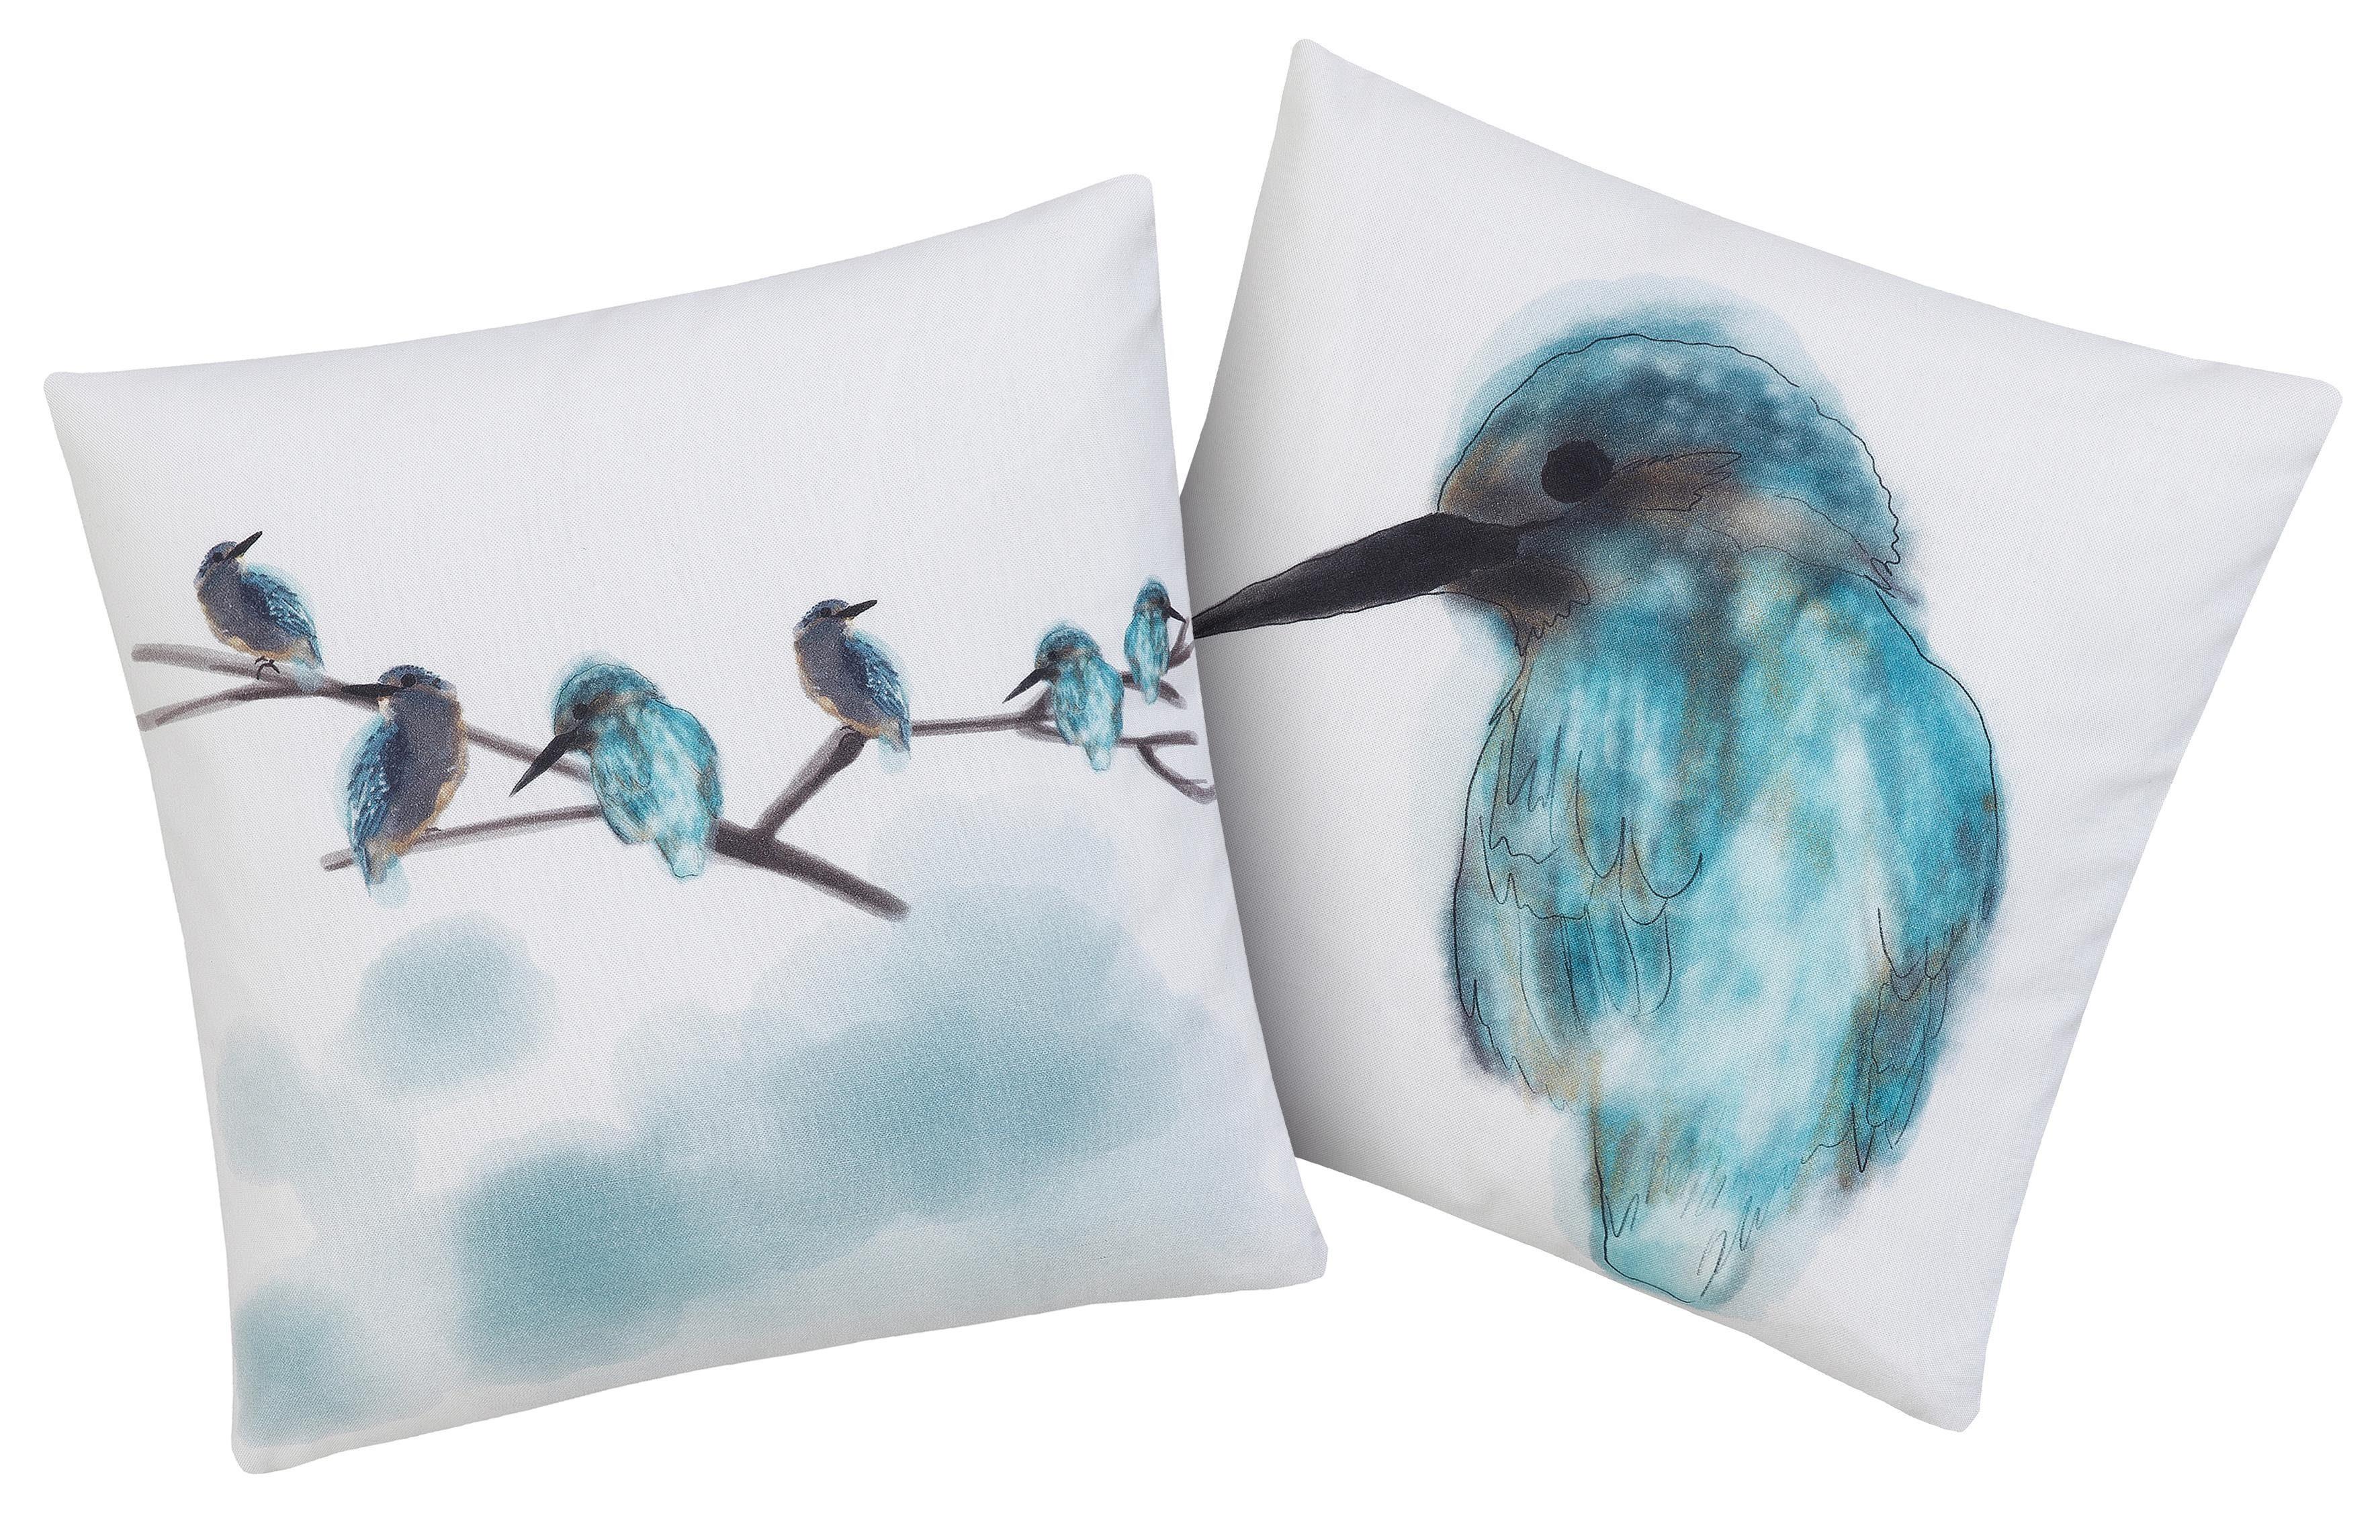 Kissenhülle »Eisvogel«, Guido Maria Kretschmer Home&Living, mit traumhaften Vogelmotiven (2 Stück)